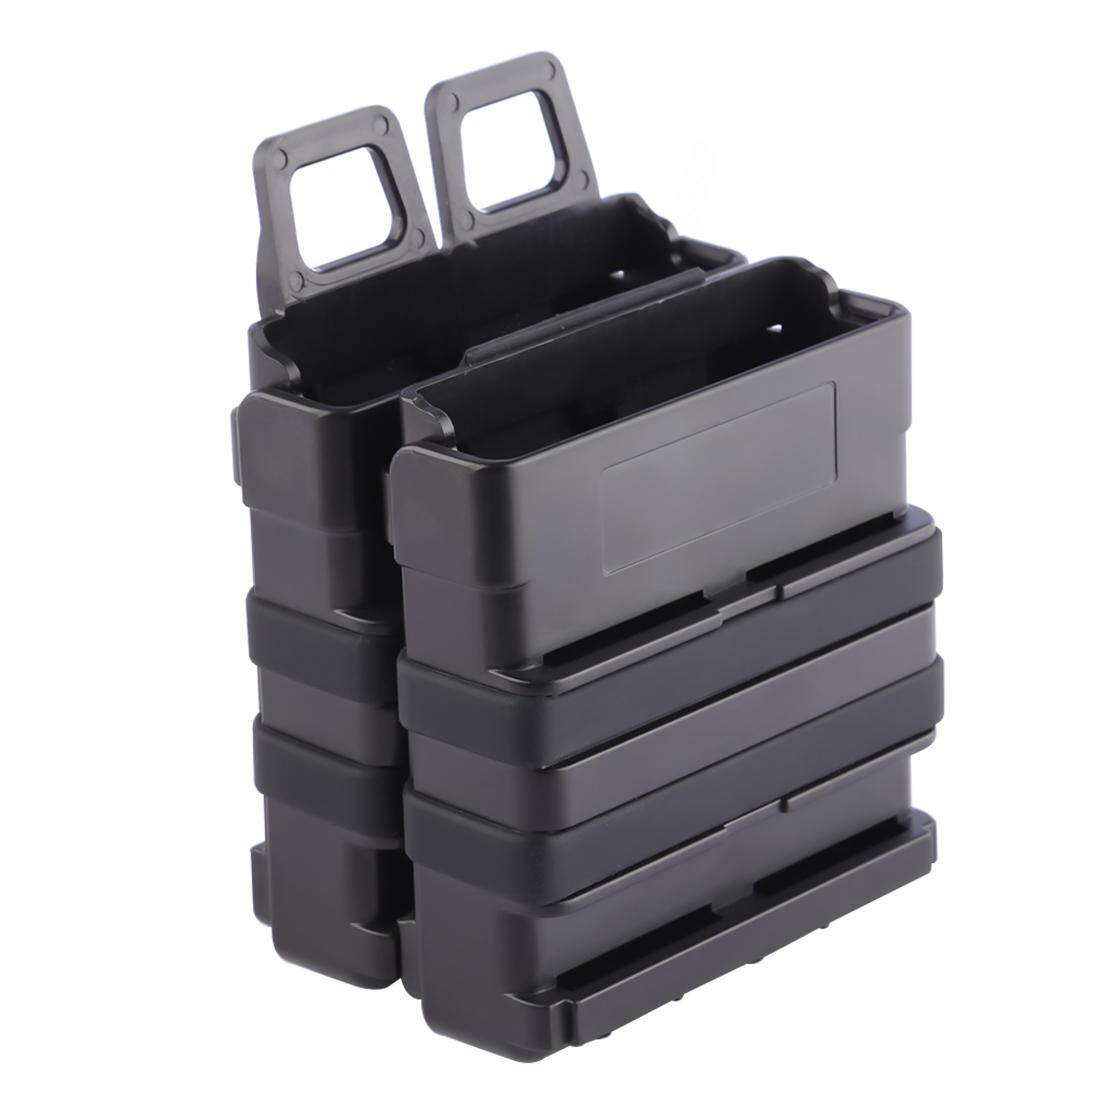 Hình ảnh 360WISH Magazine Clip Bullet Clip Holder Quick Pull Box for Nerf Tactics - Black